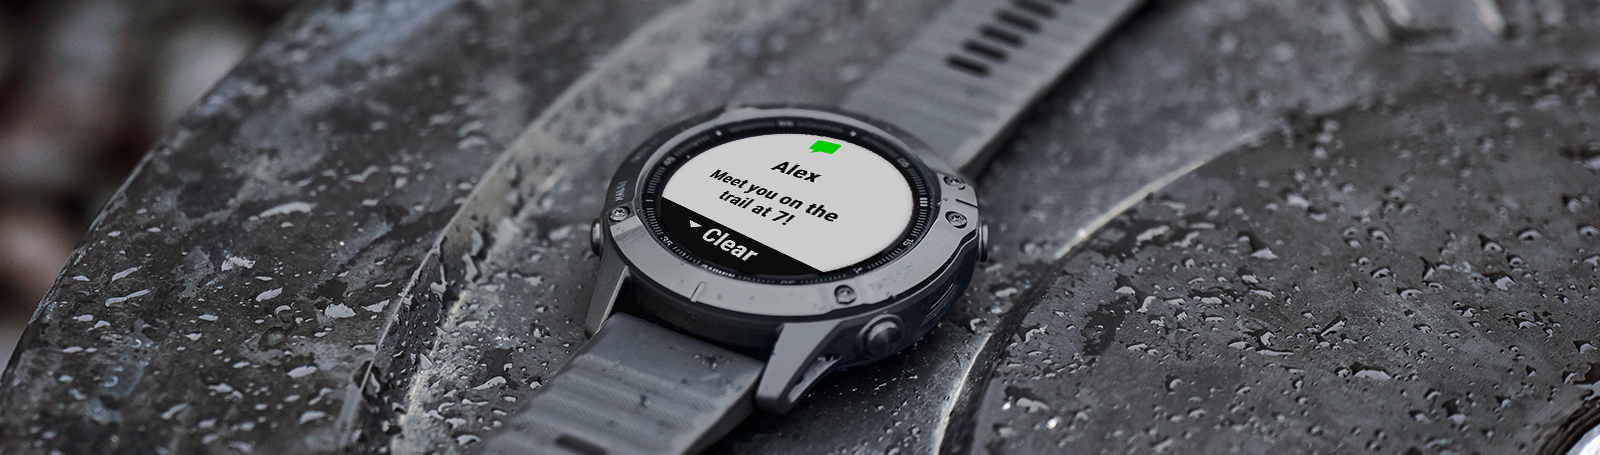 Reloj Garmin Fenix 6 Multideporte con Gps 7